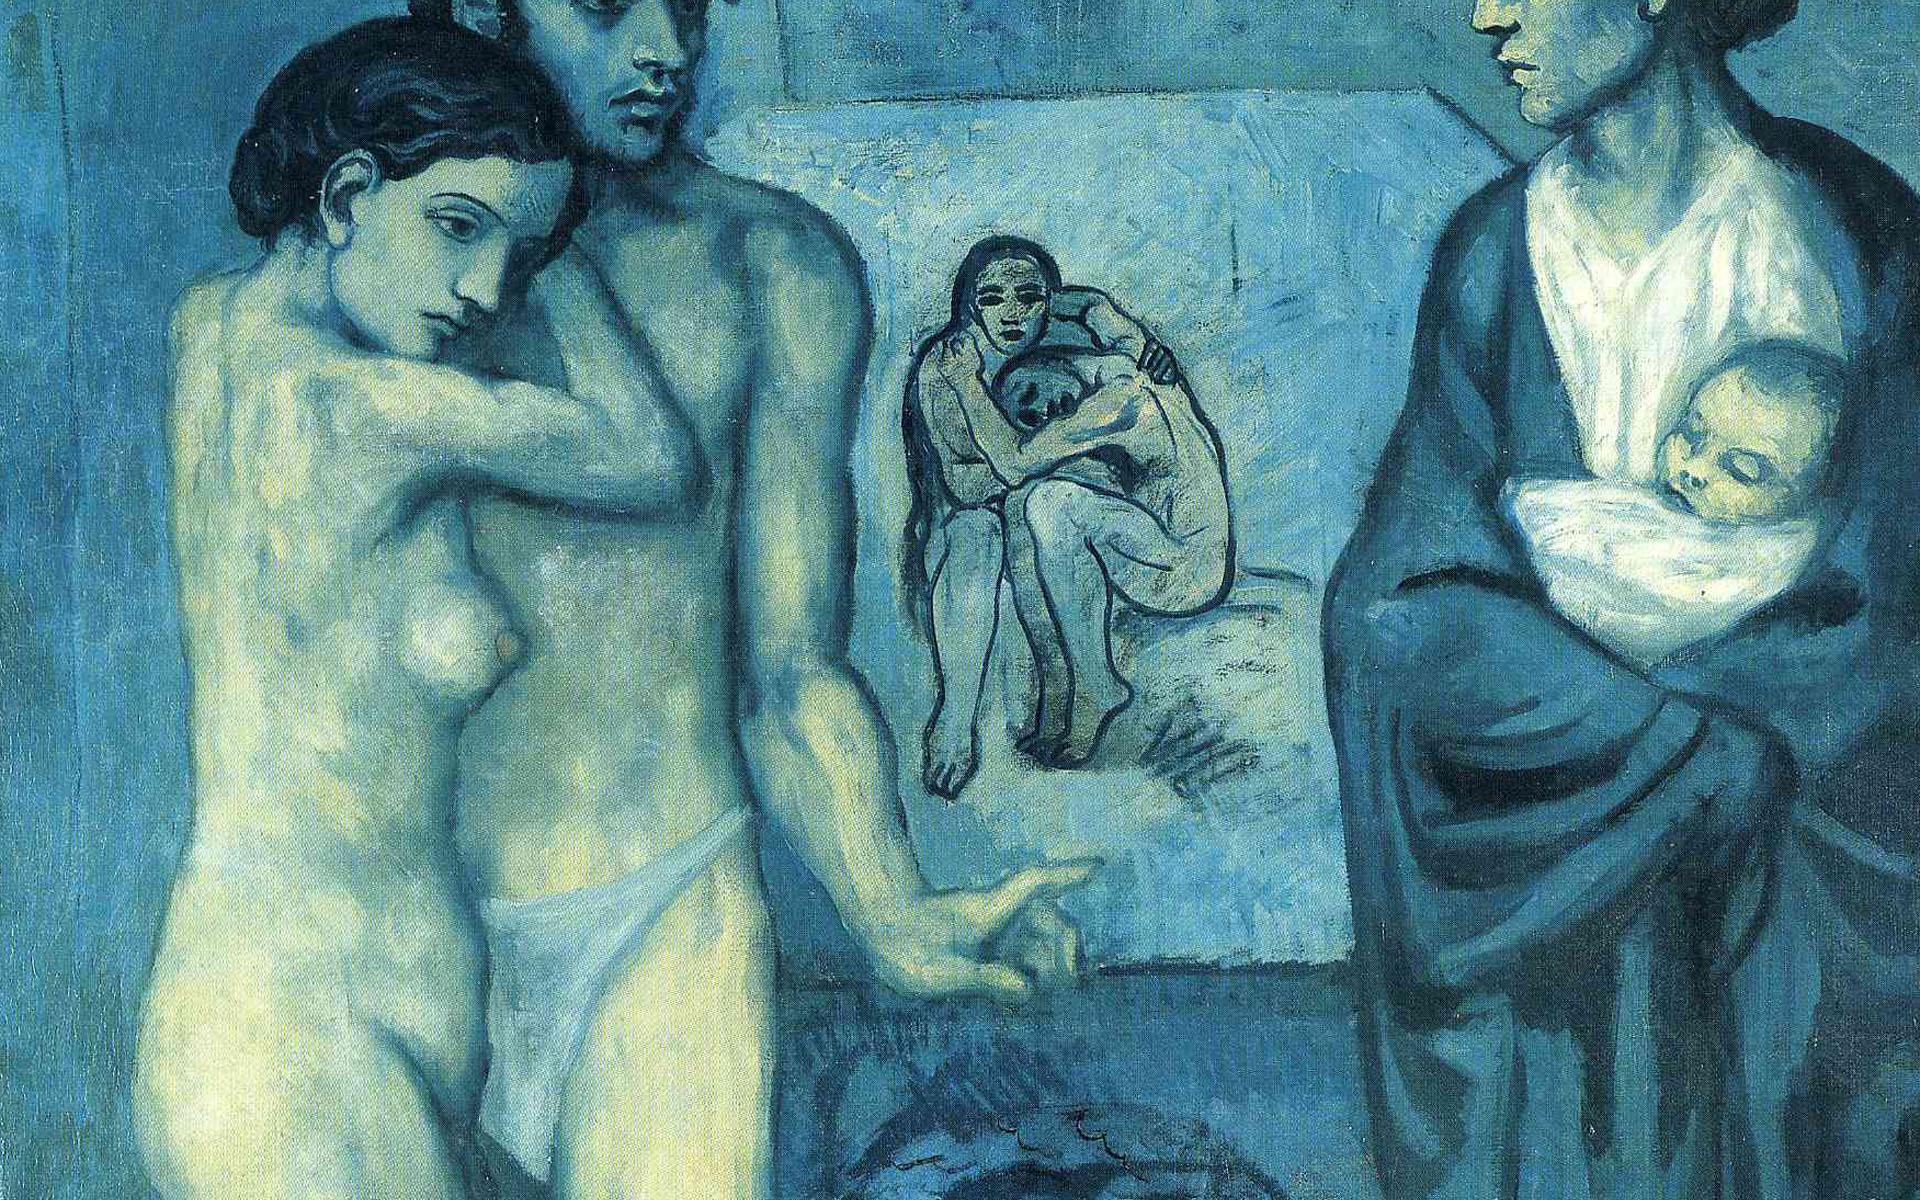 Pablo Picasso Wallpaper, Life